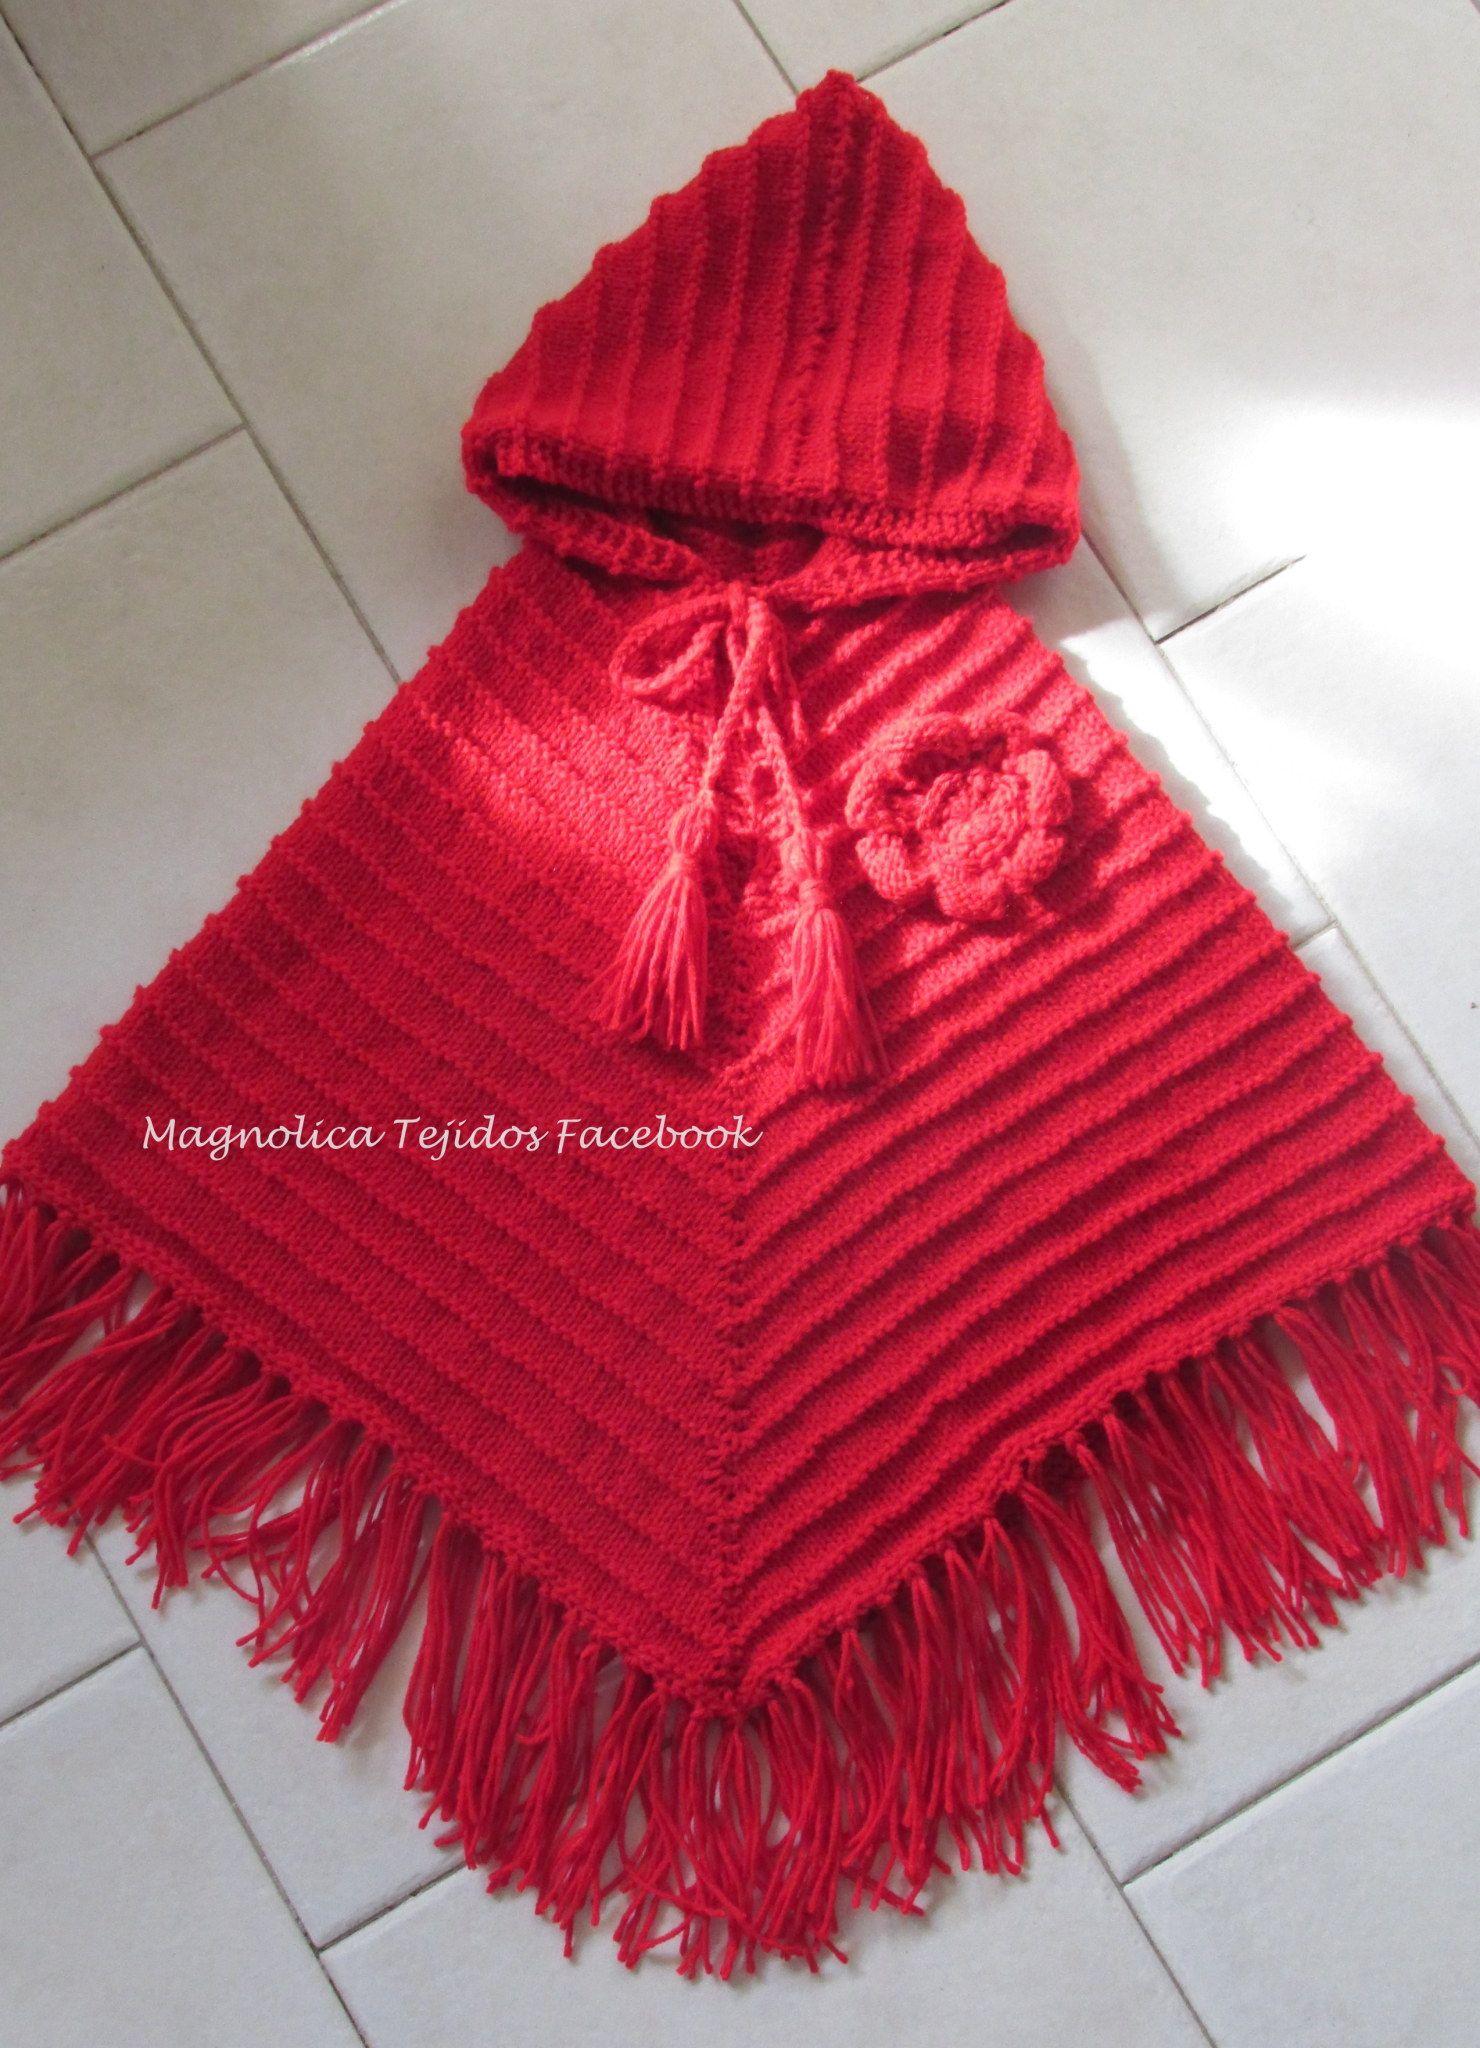 Poncho rojo niña | manualidades | Pinterest | Ponchos, Regalitos y ...